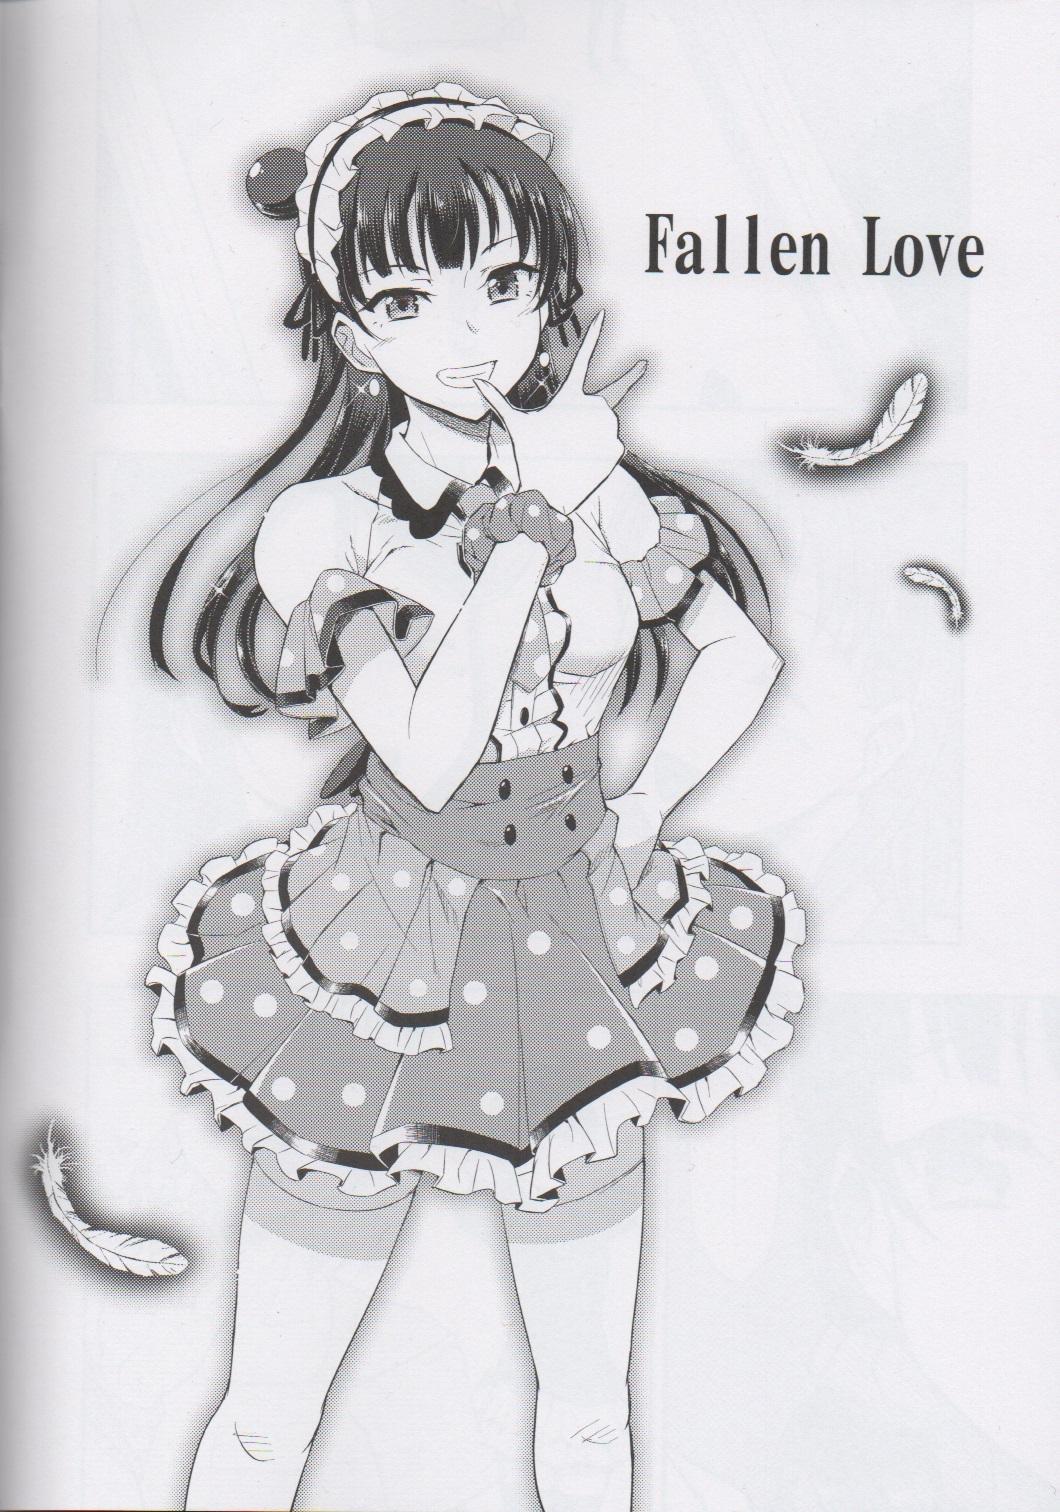 Fallen Love 2